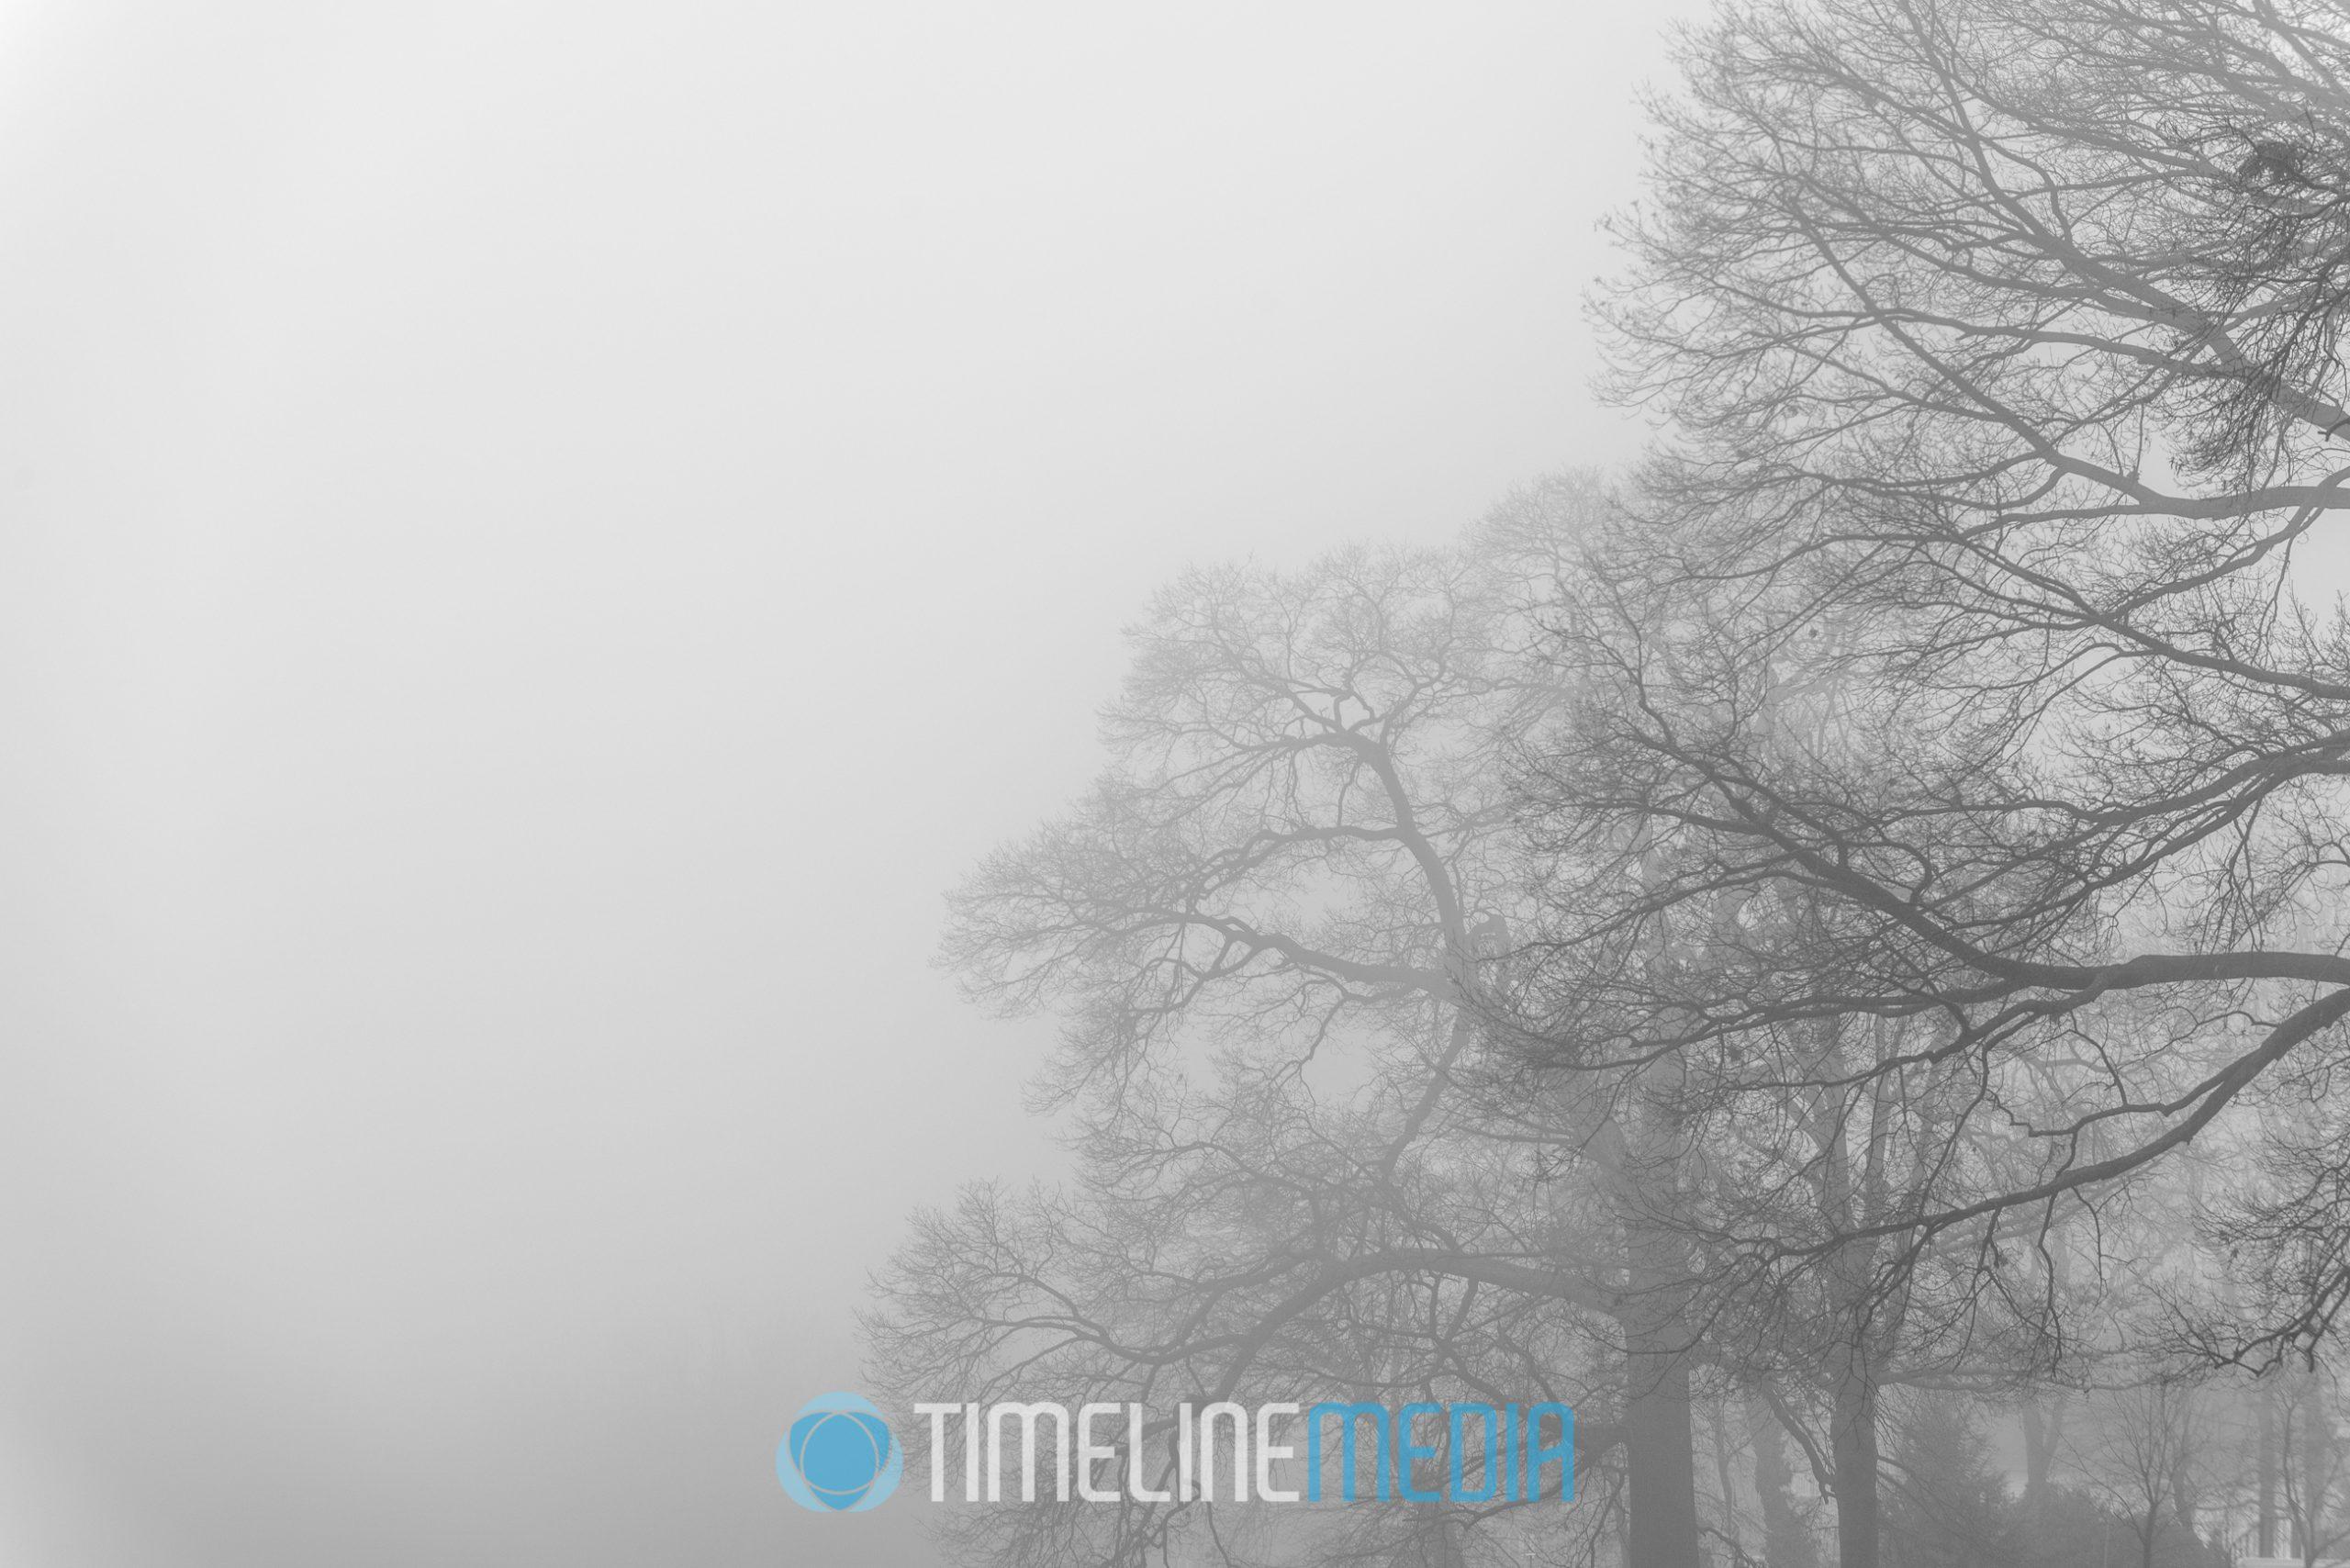 Foggy trees make a minimal composition